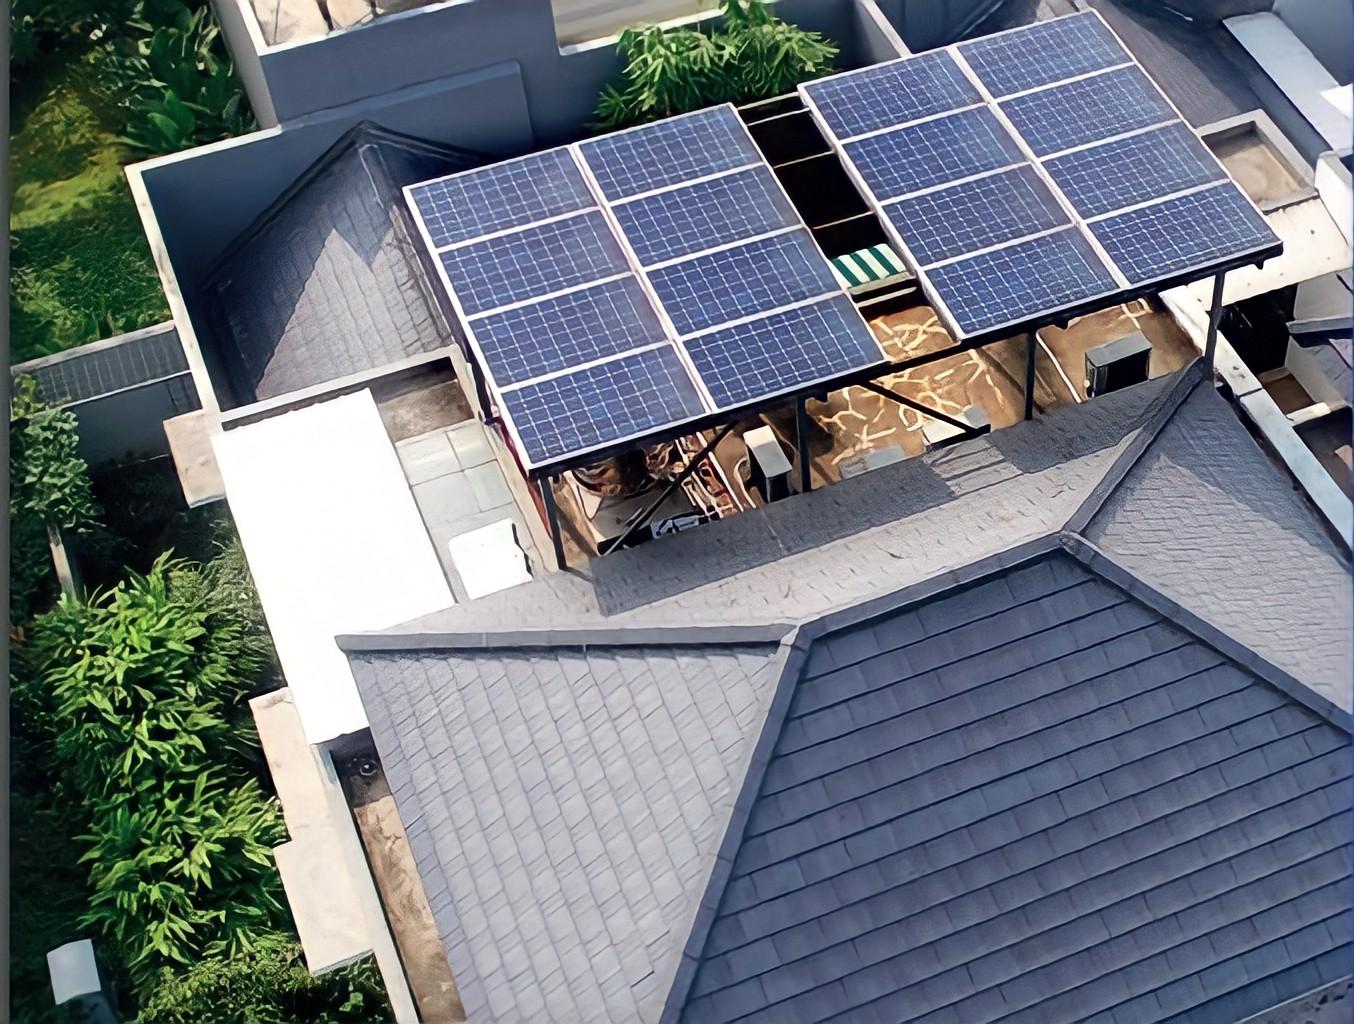 Rumah Indonesia dengan teknologi PLTS Atap | Foto: Ditjen EBTKE Kementerian ESDM